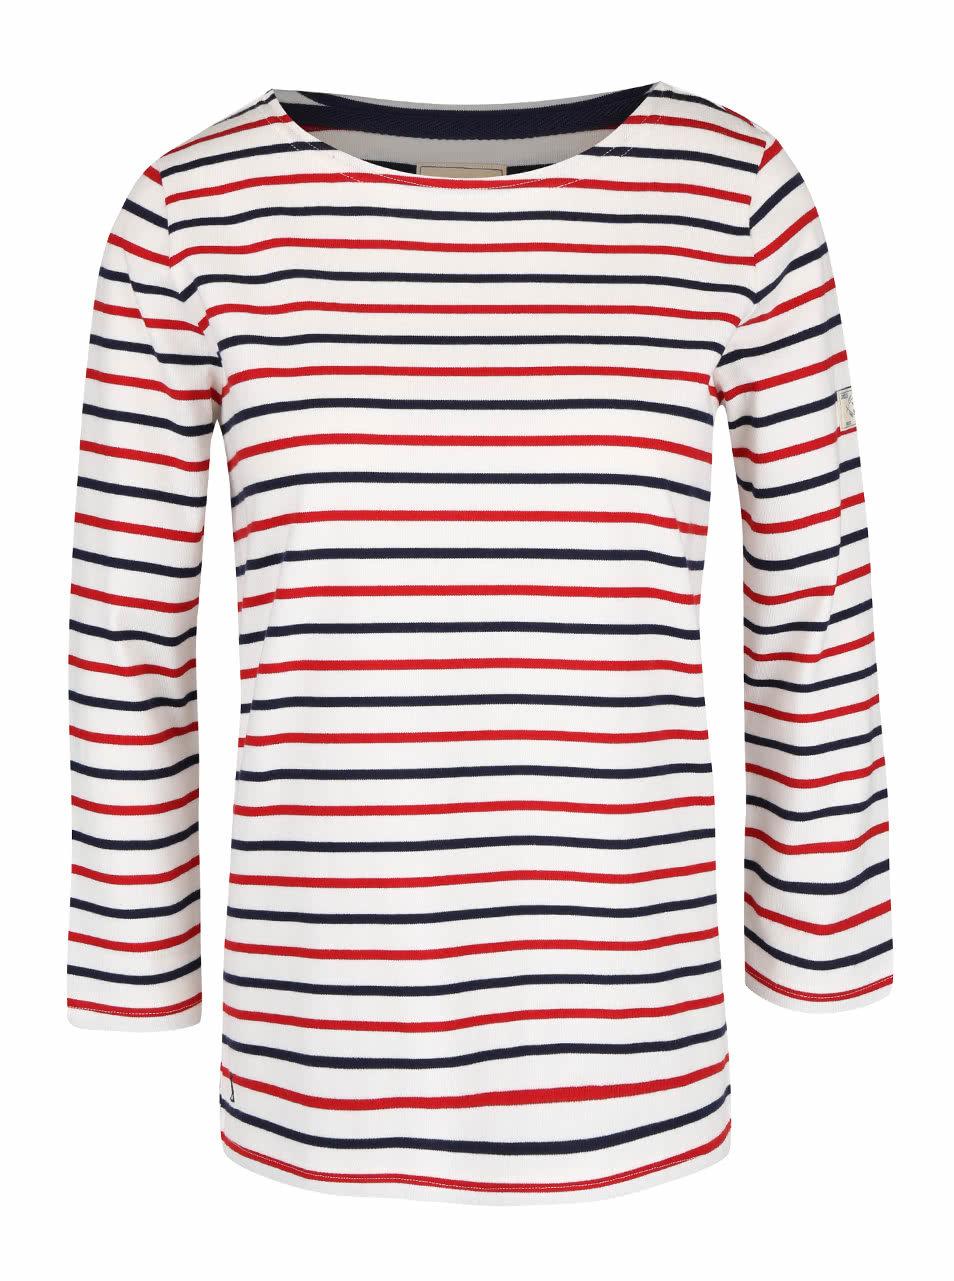 1587f76e23 Krémové dámske tričko s modro-červenými pruhmi Tom Joule Harbour ...